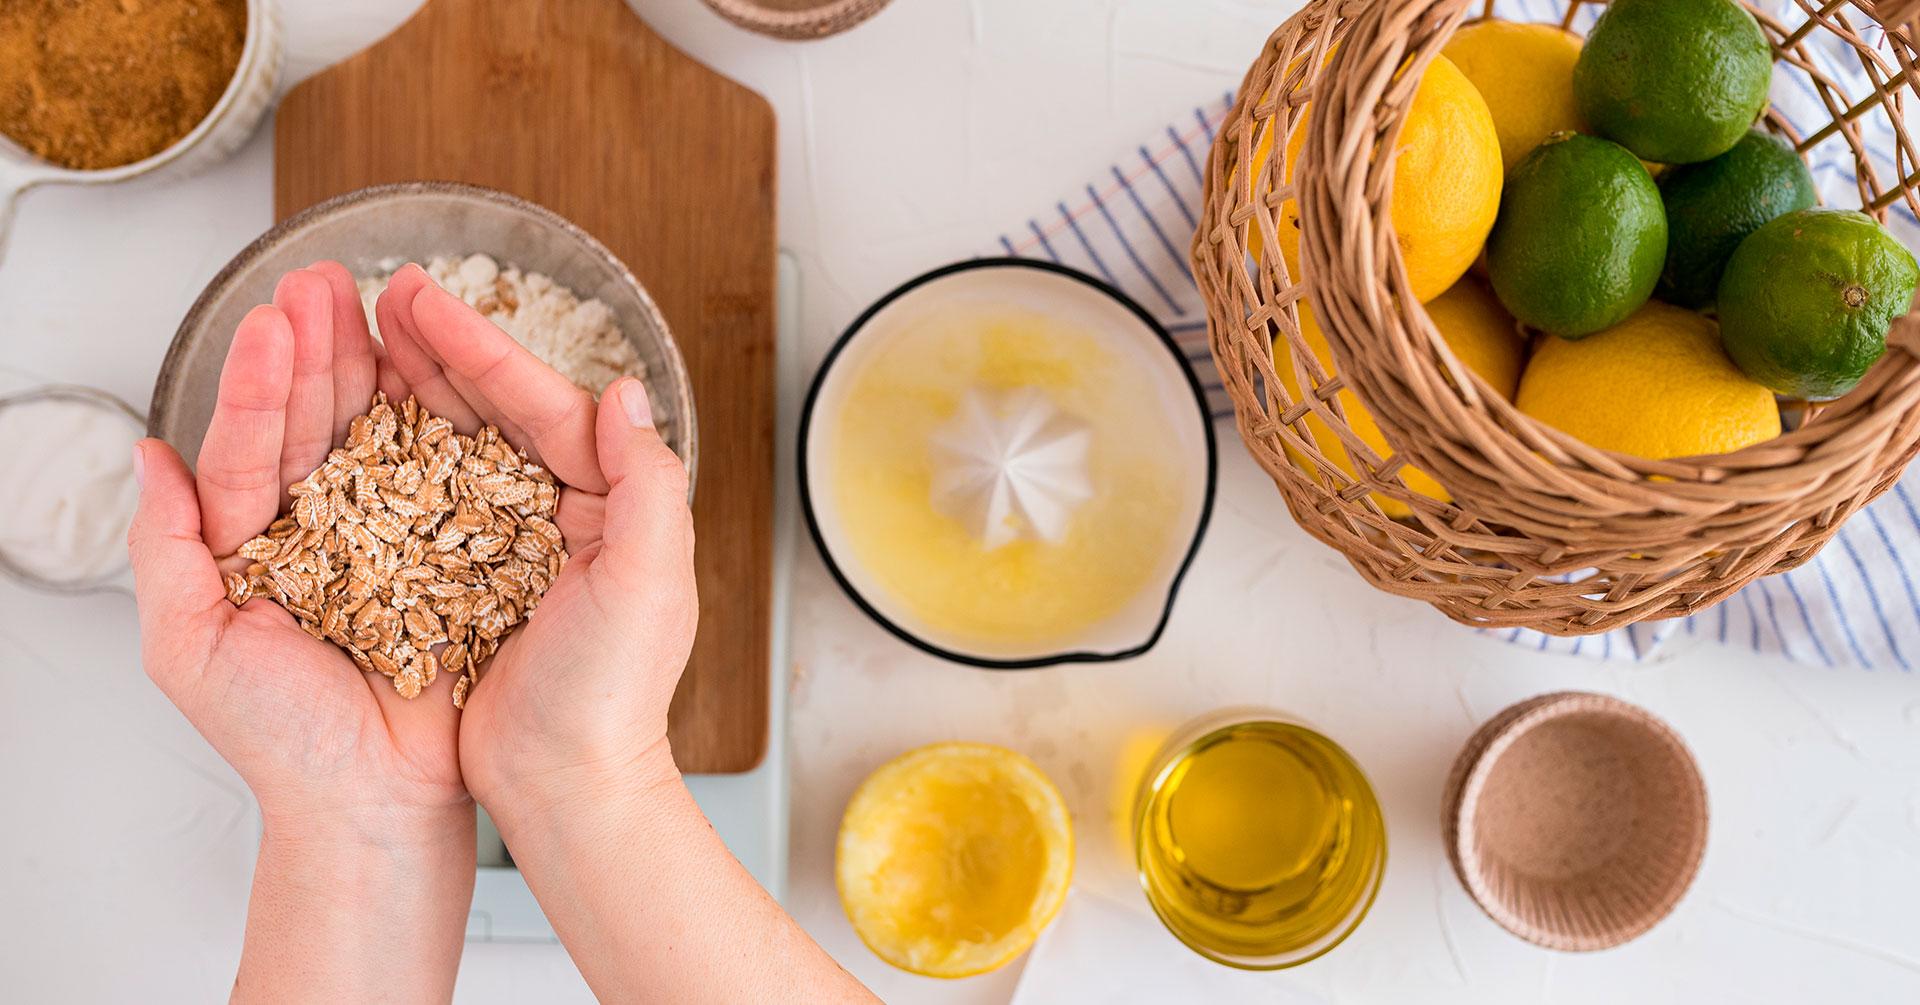 Agua de avena con limón: una bebida con múltiples beneficios para tu día